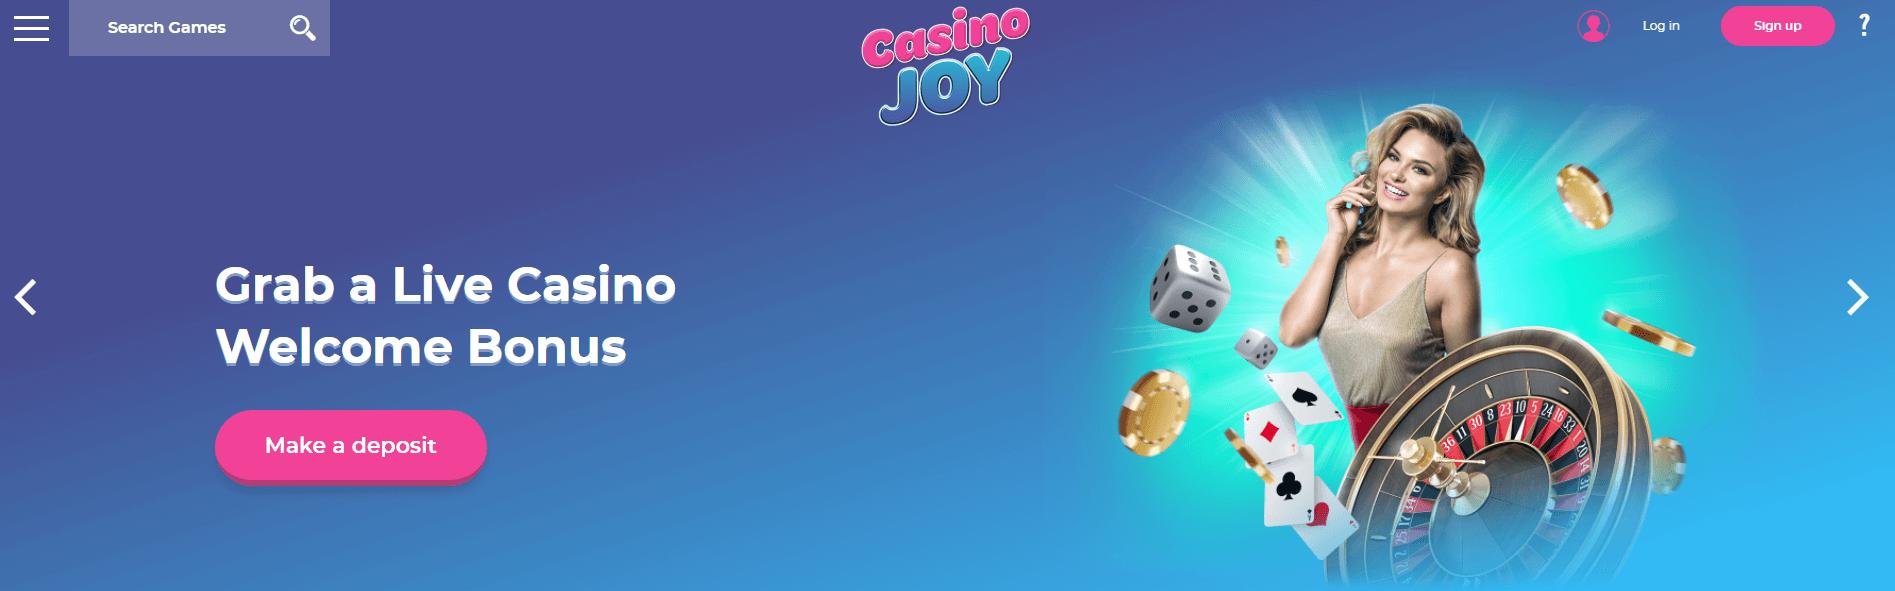 Live Casino welcome casino Joy